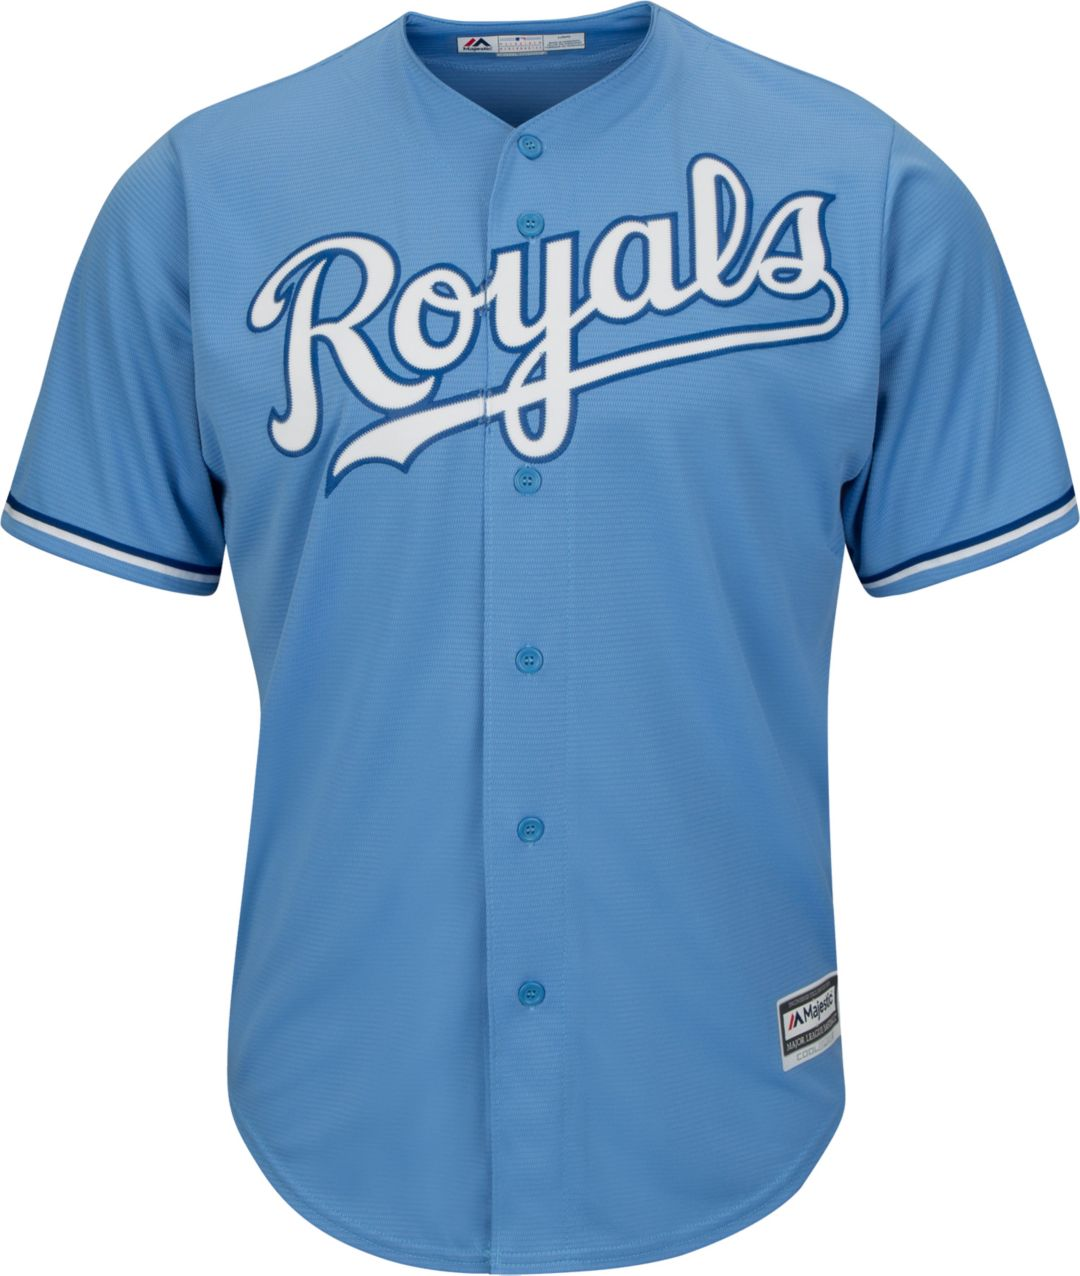 12862695 Majestic Men's Replica Kansas City Royals Salvador Perez #13 Cool Base  Alternate Light Blue Jersey